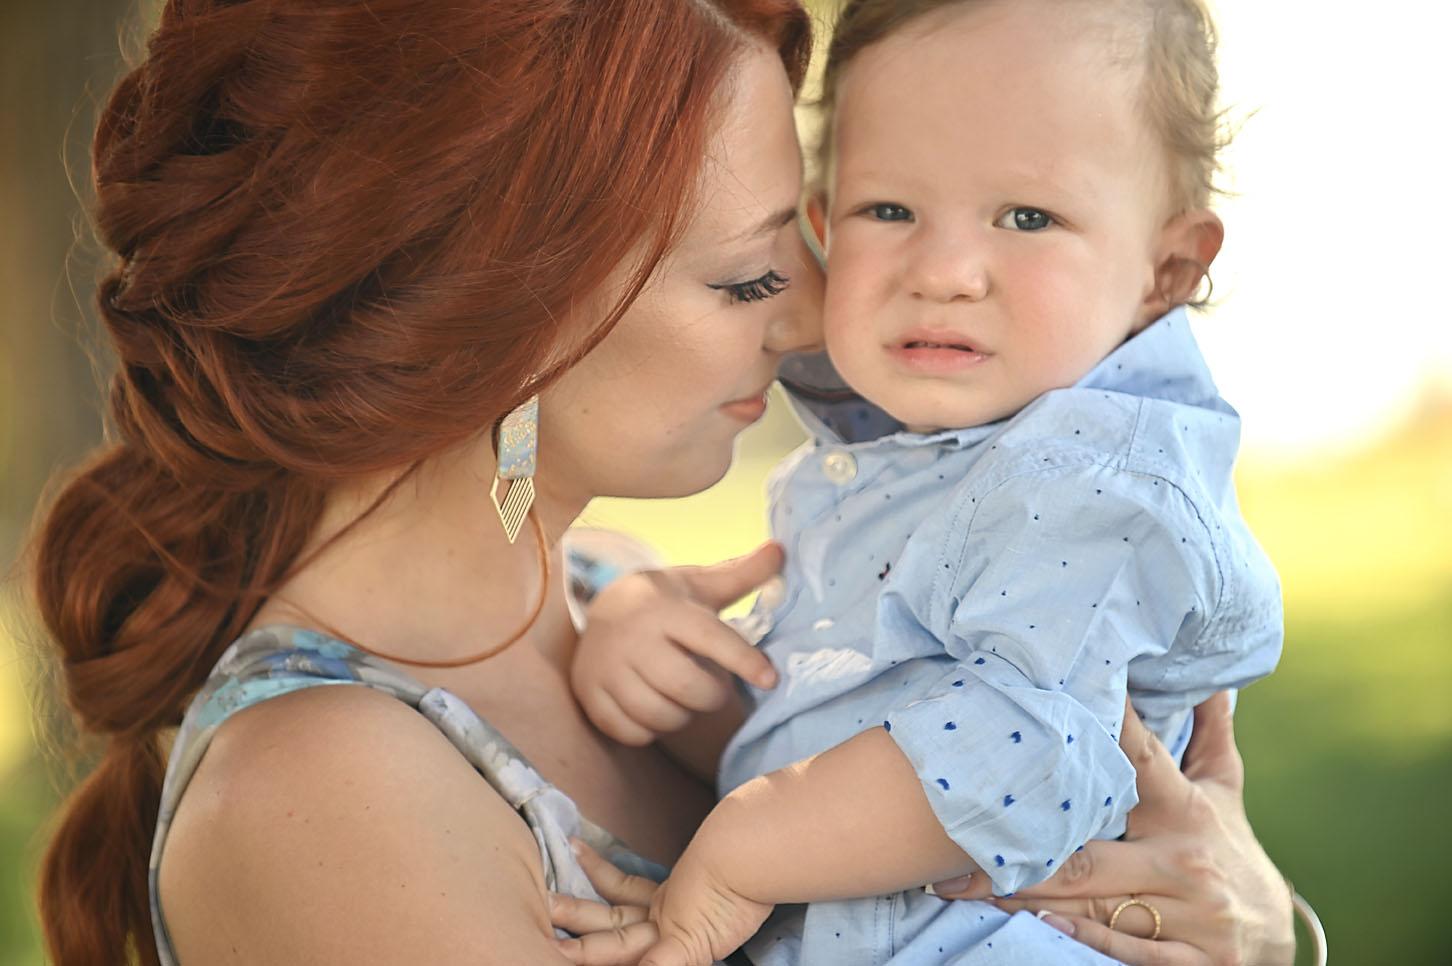 mum-son -family-portraits -l arissas-alexis-koumaditis-photography-01